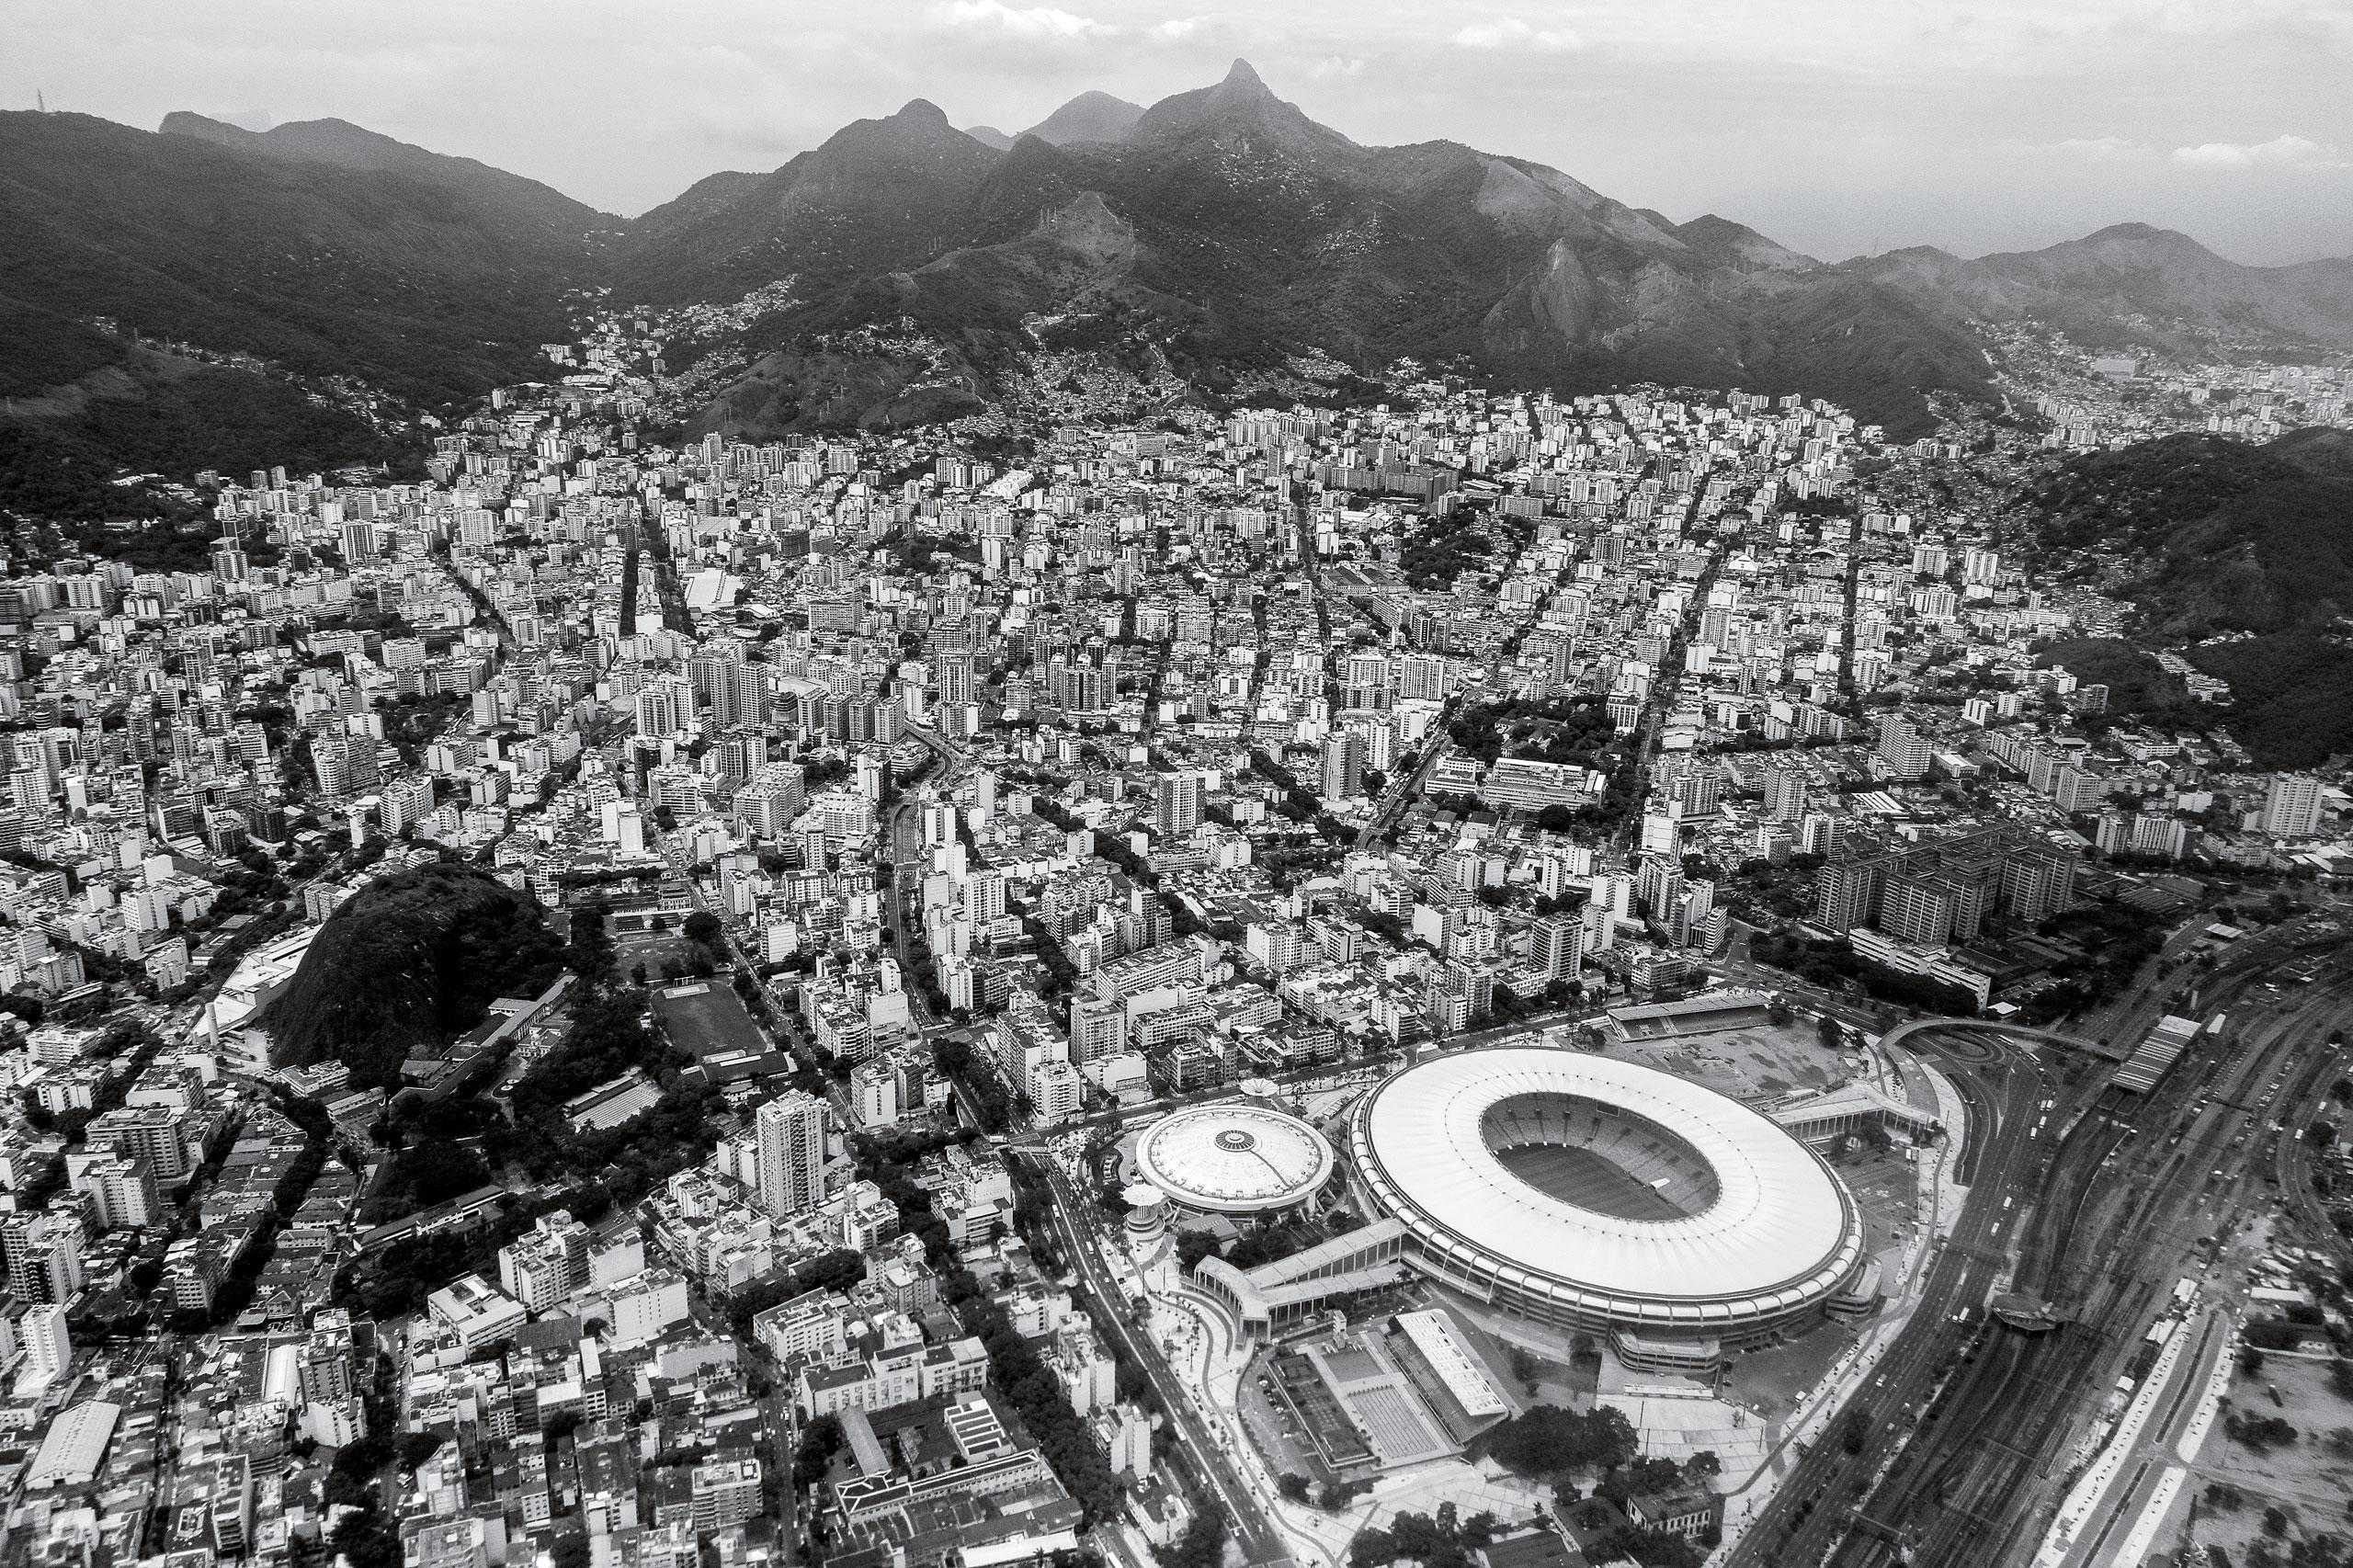 Rio sprawls                    around Maracanã Stadium, site of the opening and closing ceremonies